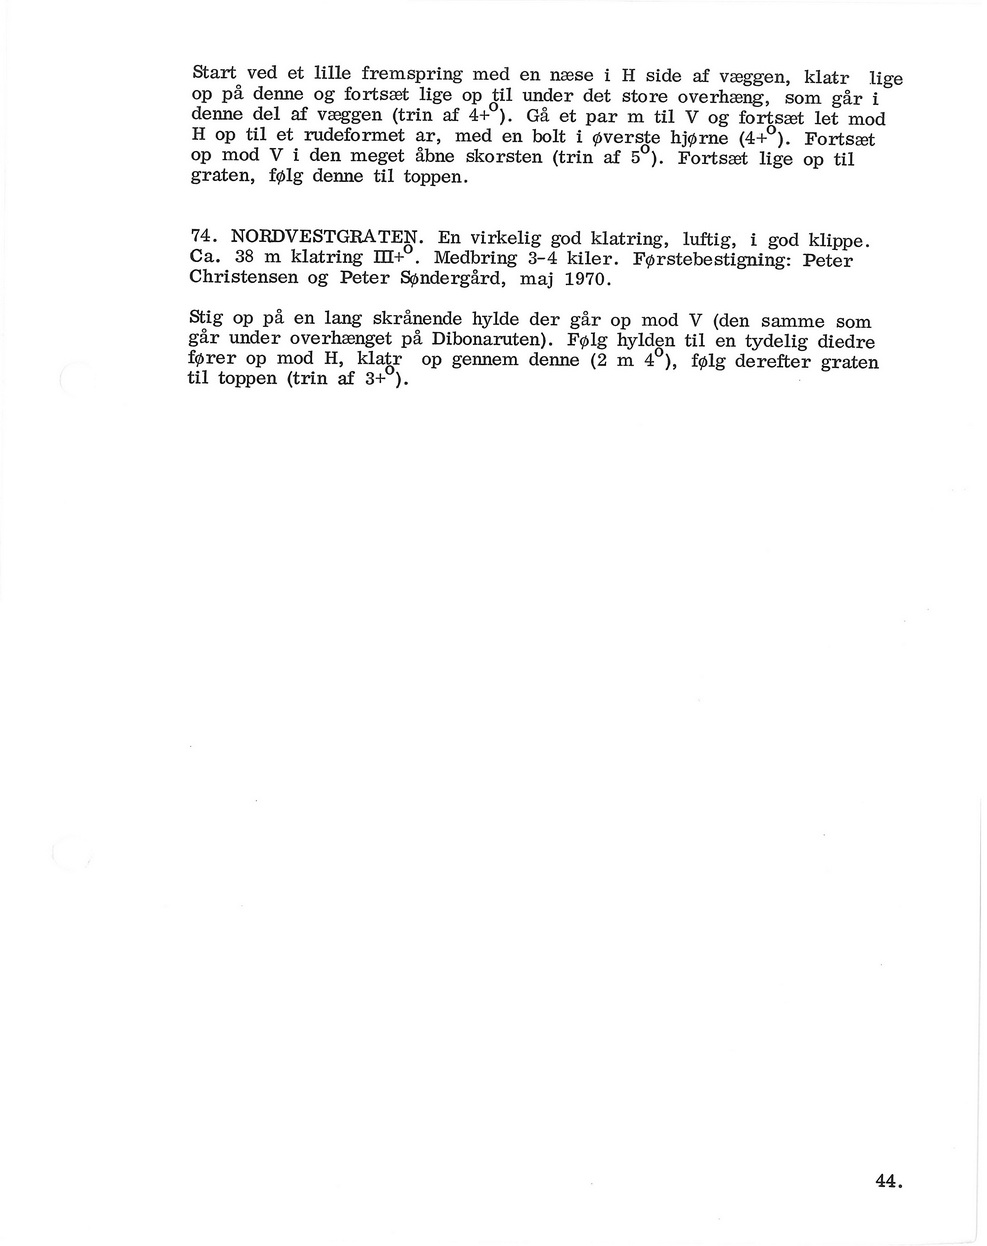 Kullen guide 1972 044.jpg